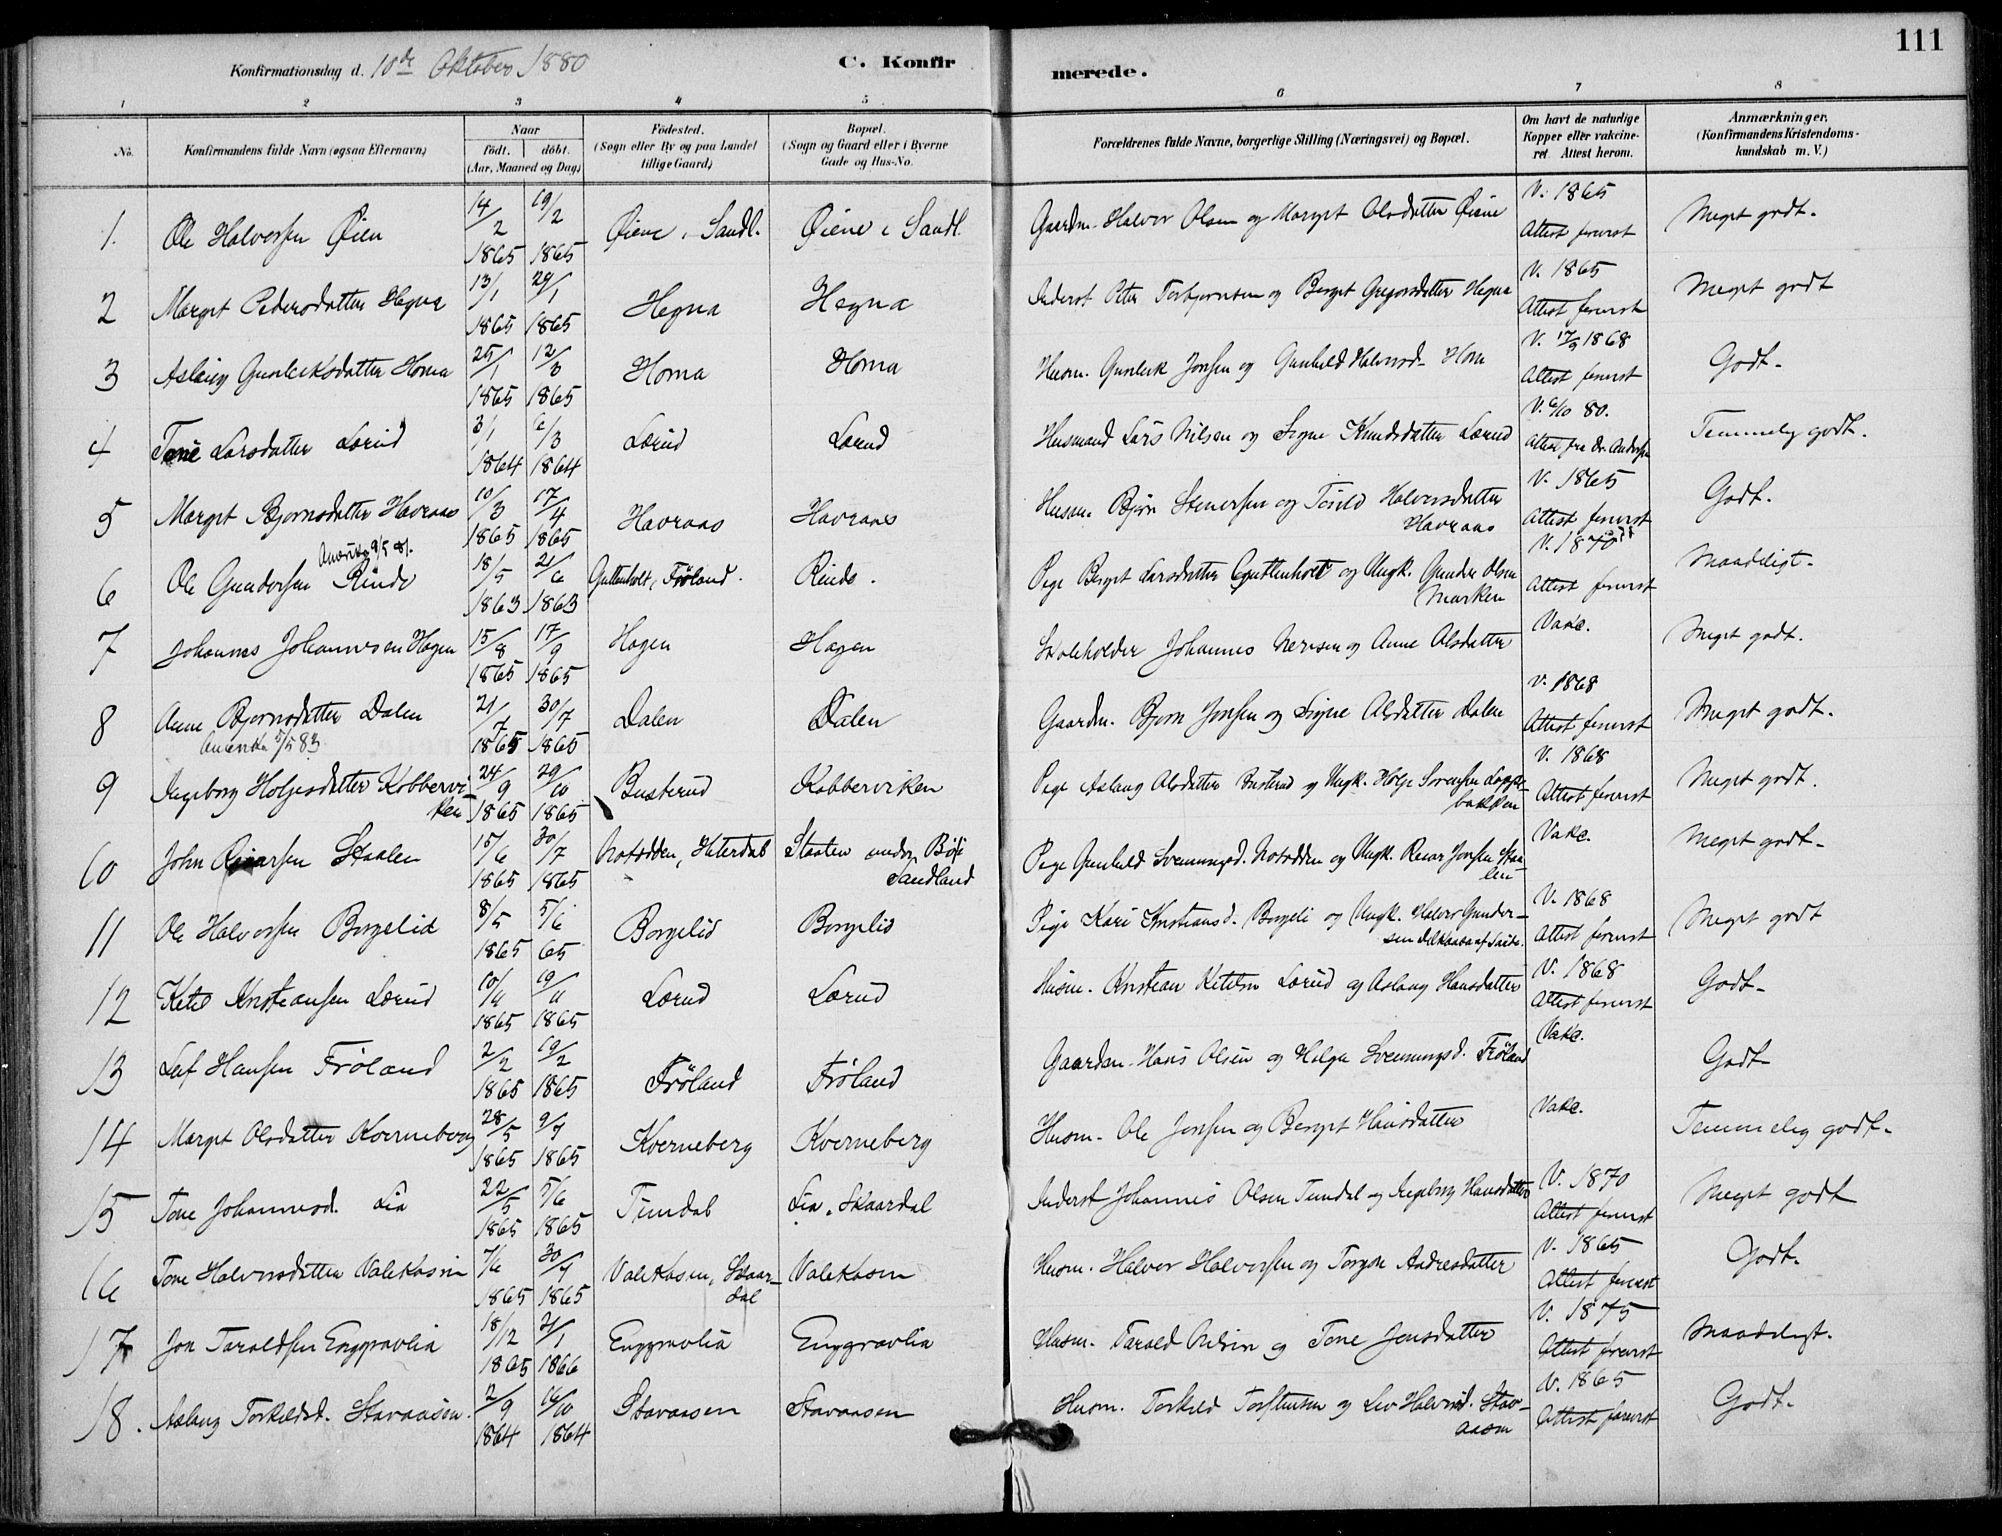 SAKO, Hjartdal kirkebøker, F/Fb/L0002: Ministerialbok nr. II 2, 1880-1932, s. 111